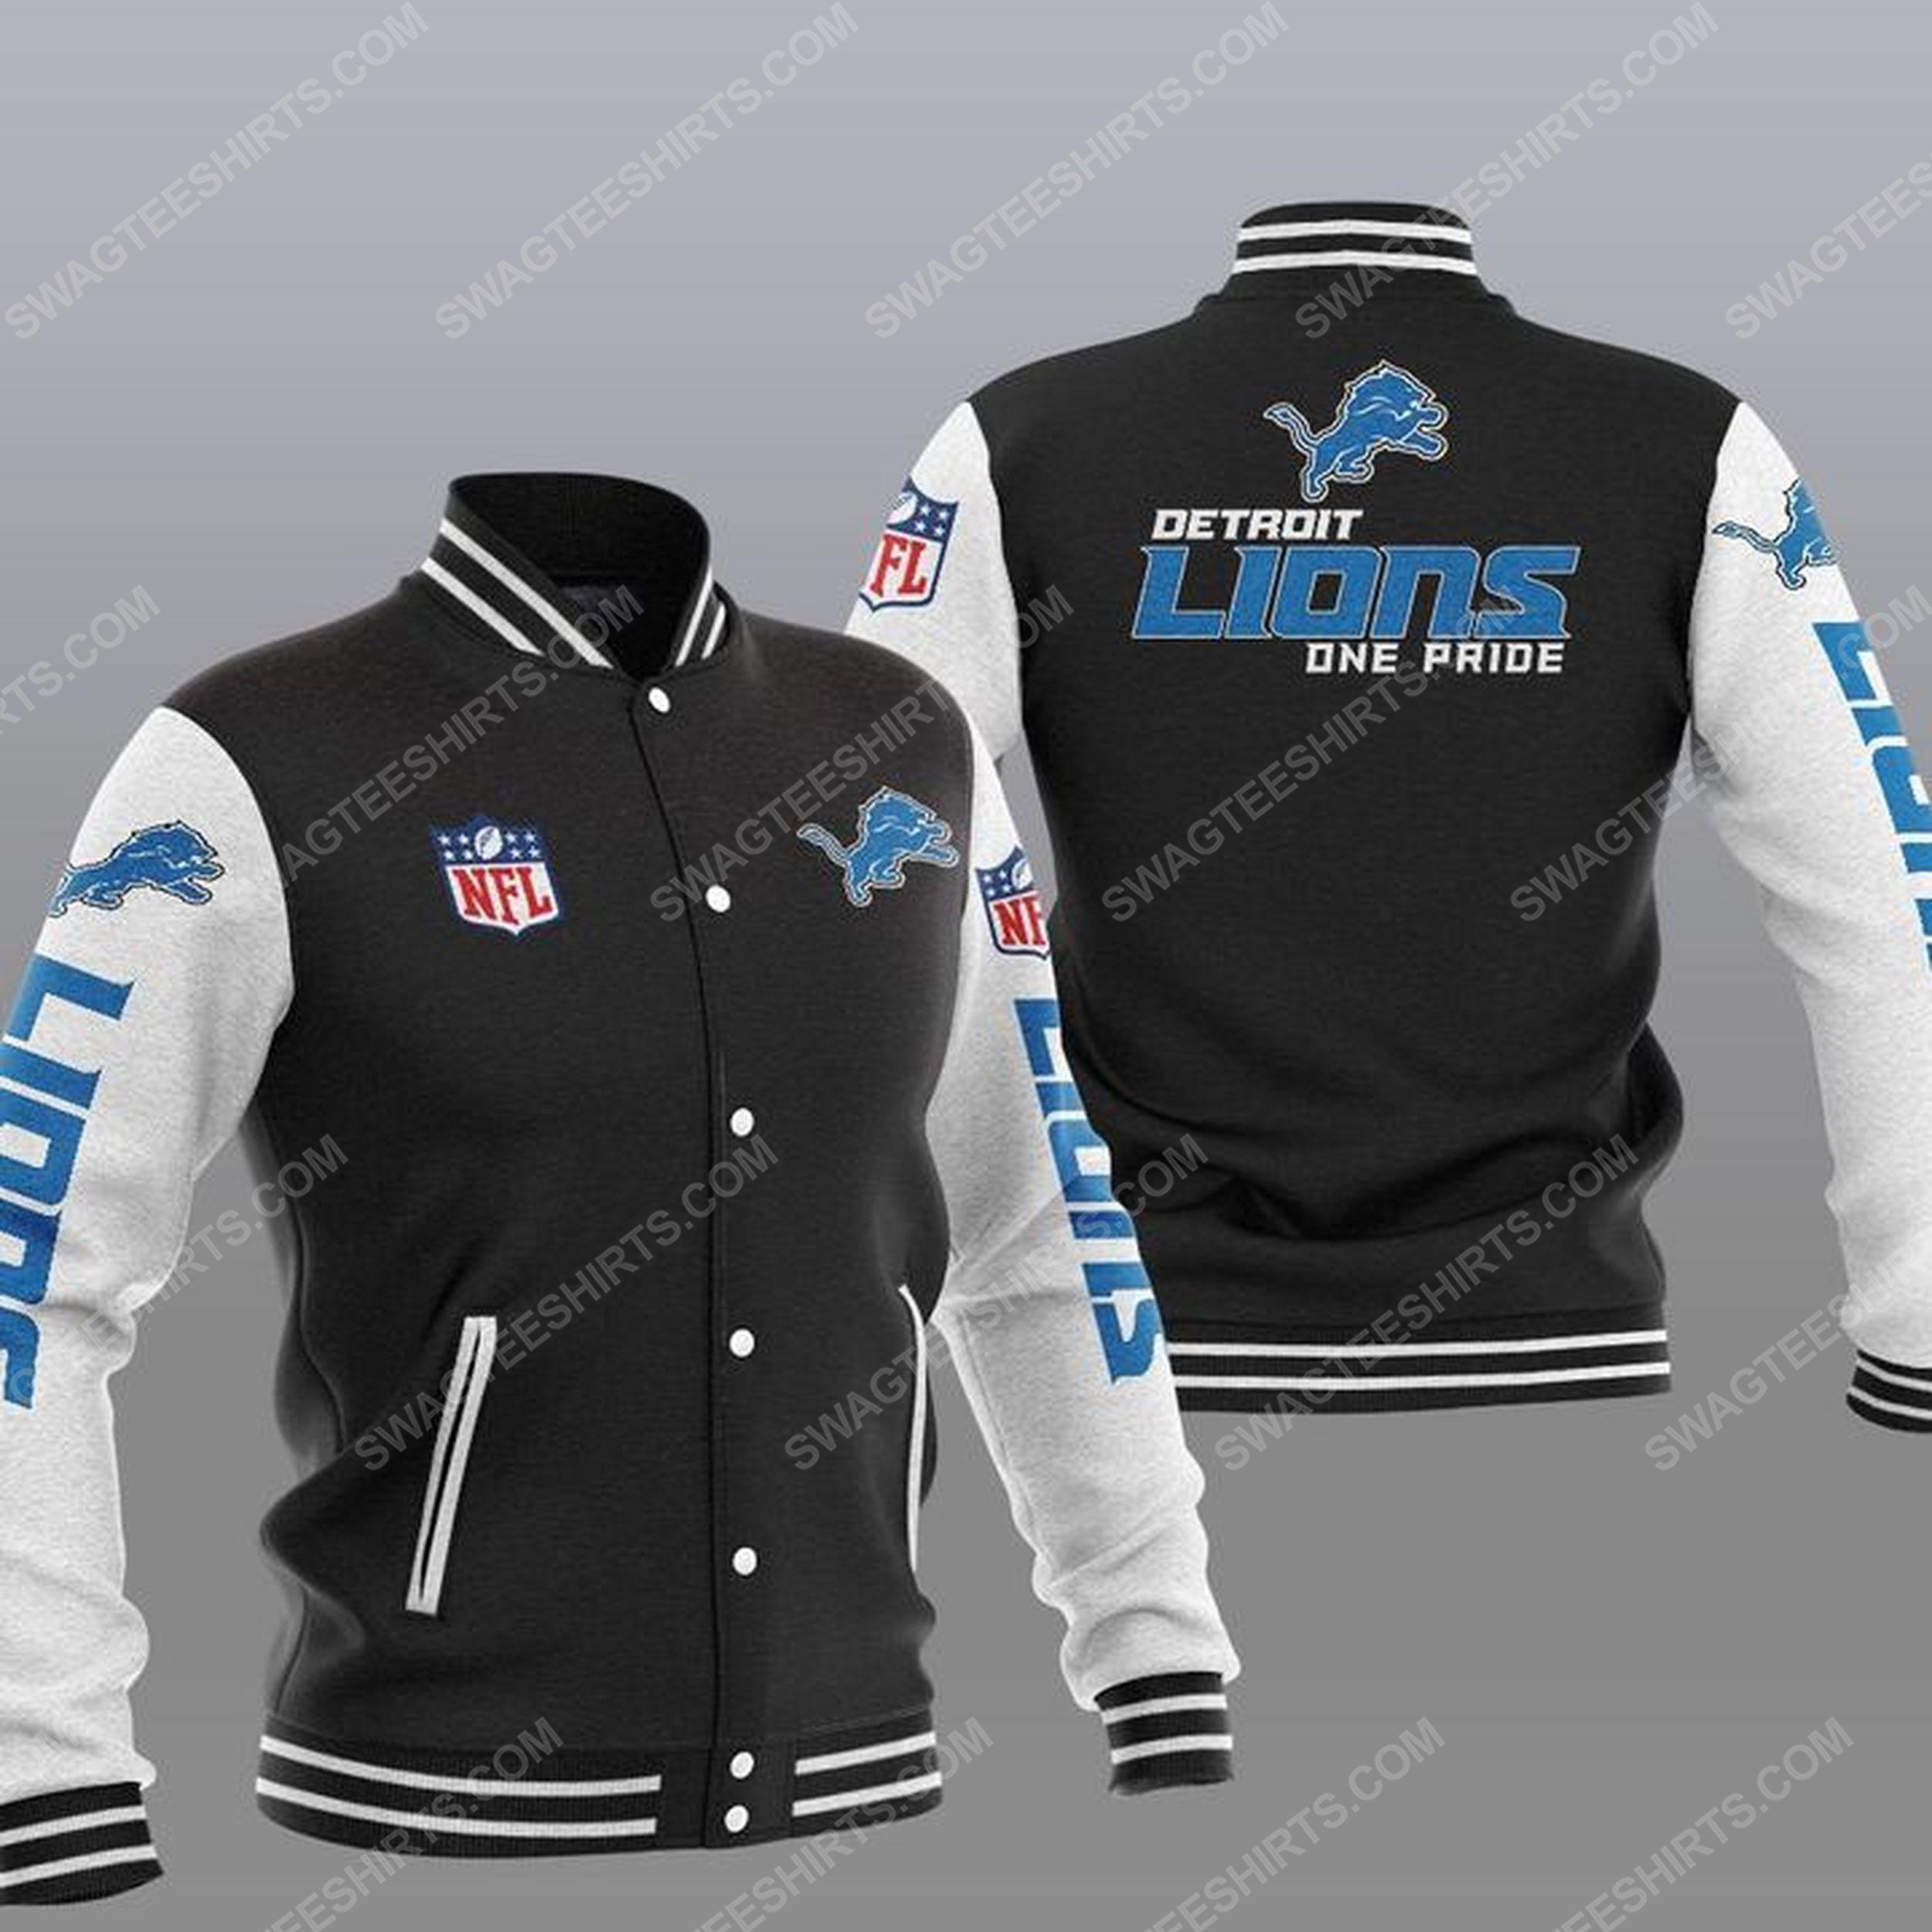 Detroit lions one pride all over print baseball jacket - black 1